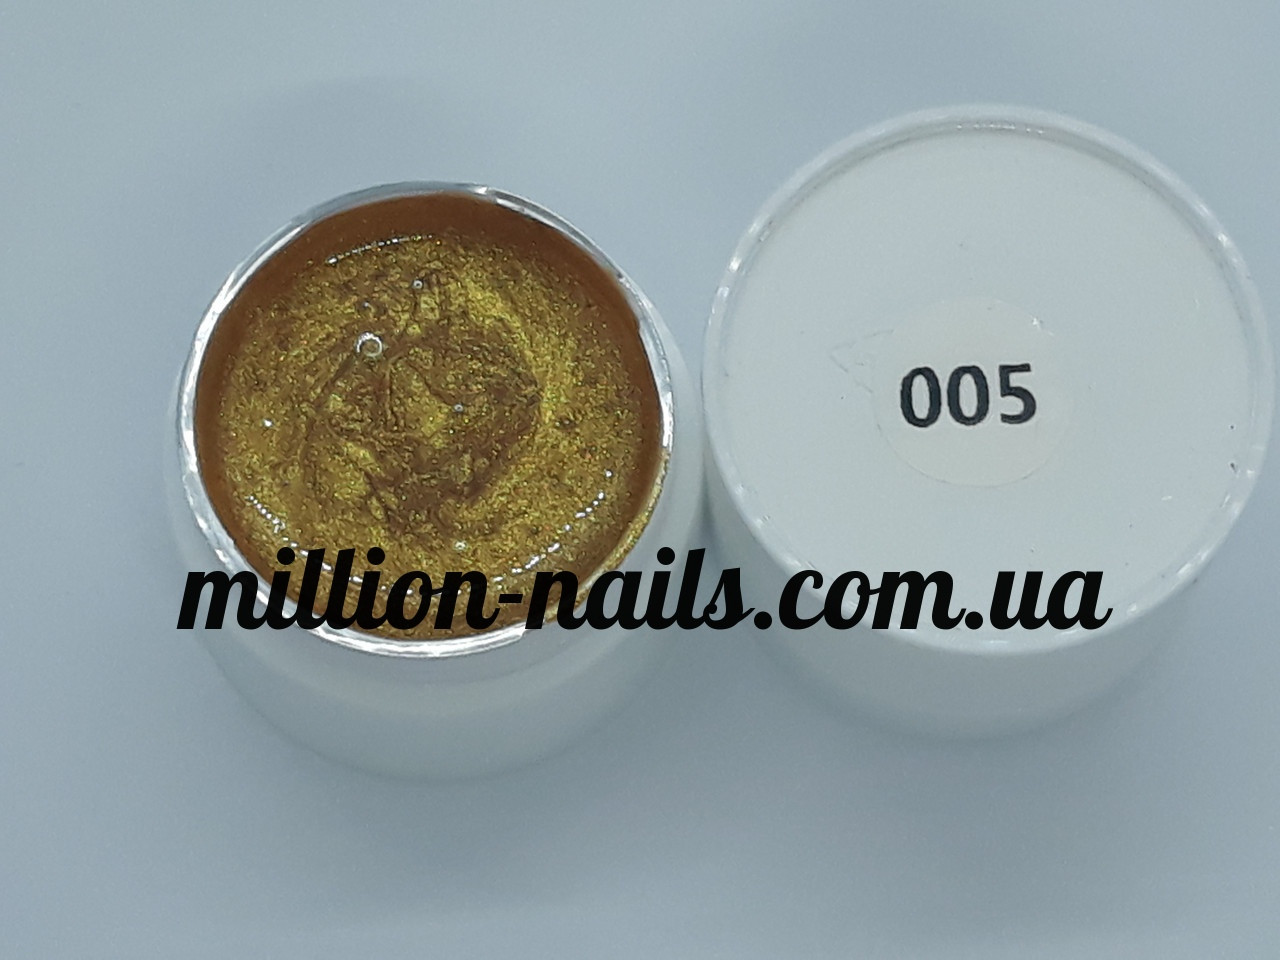 Гель-краска  для ногтей UK.Nail №05 цвет золото, 7 грамм